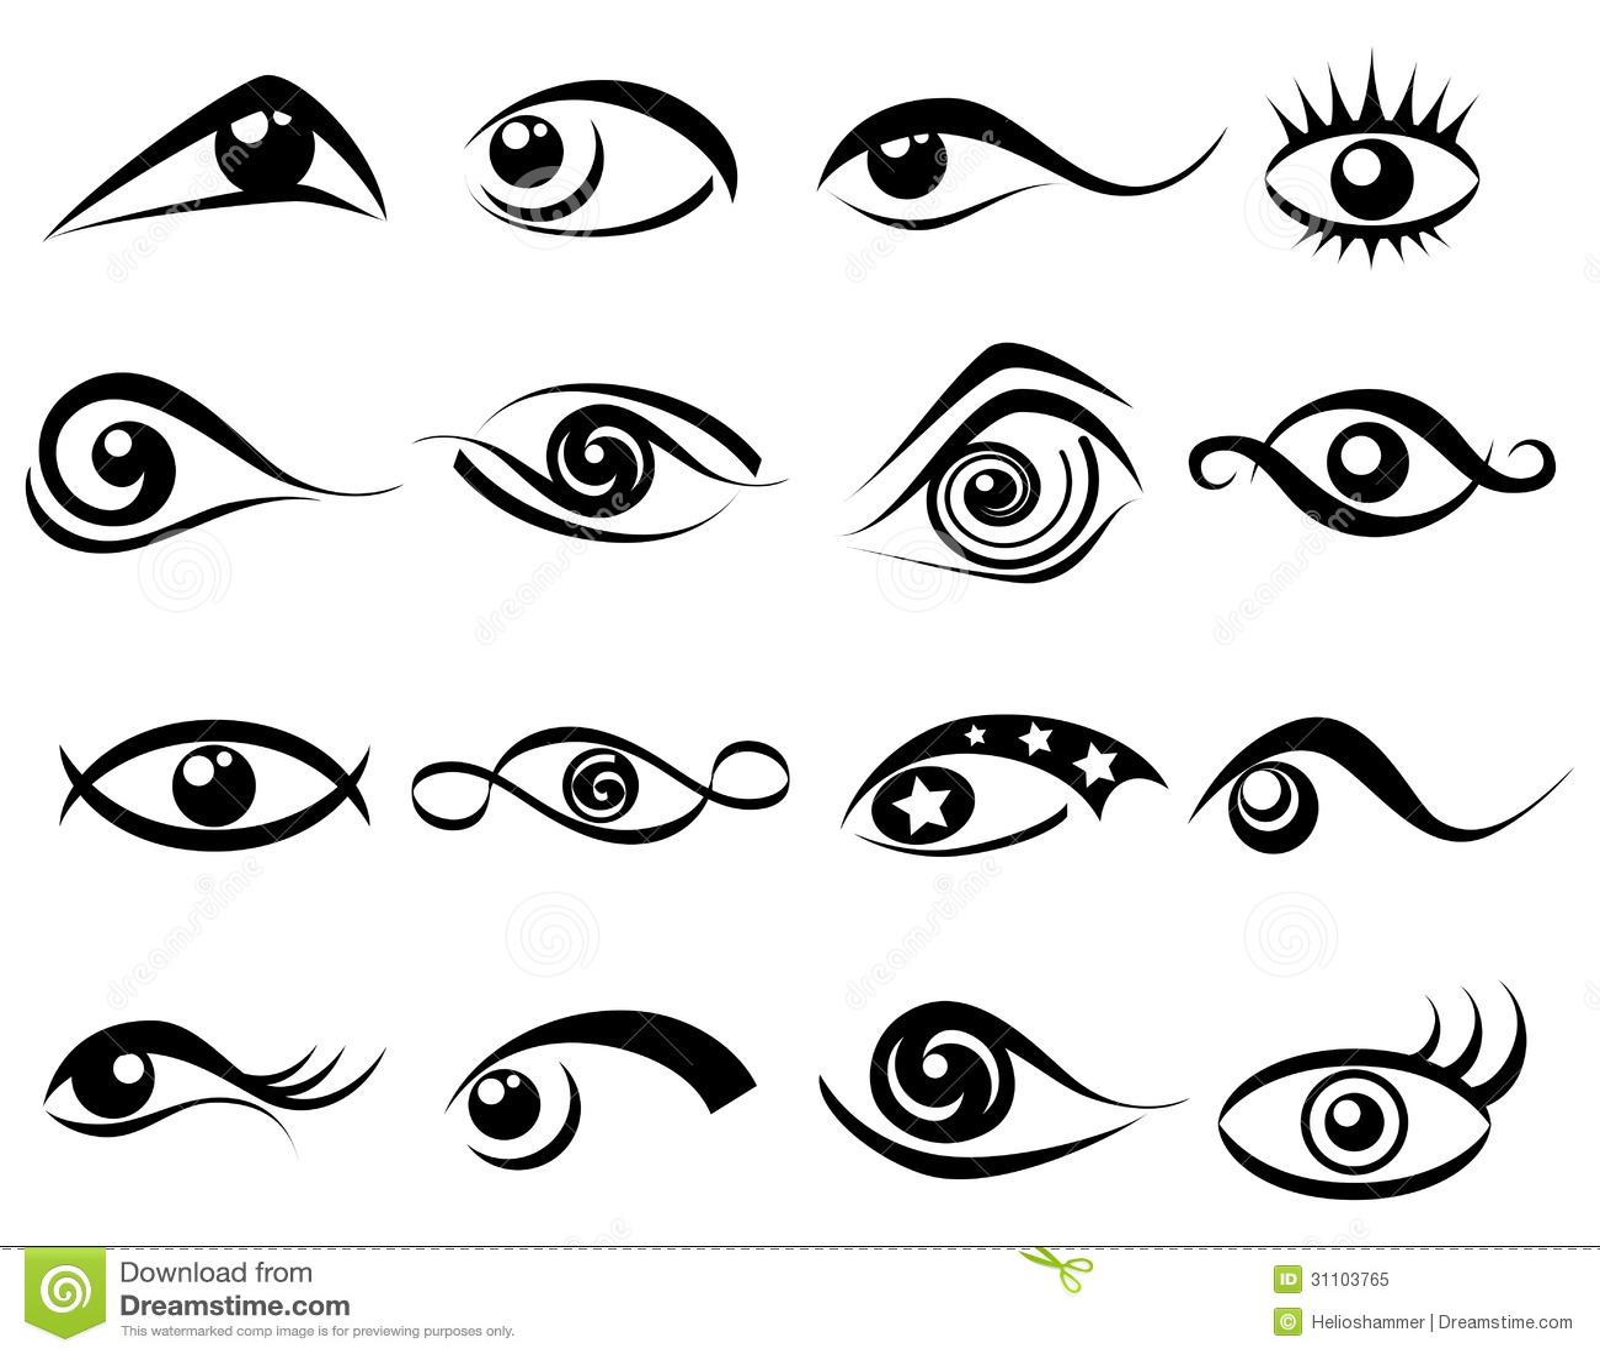 Abstract Eye Design